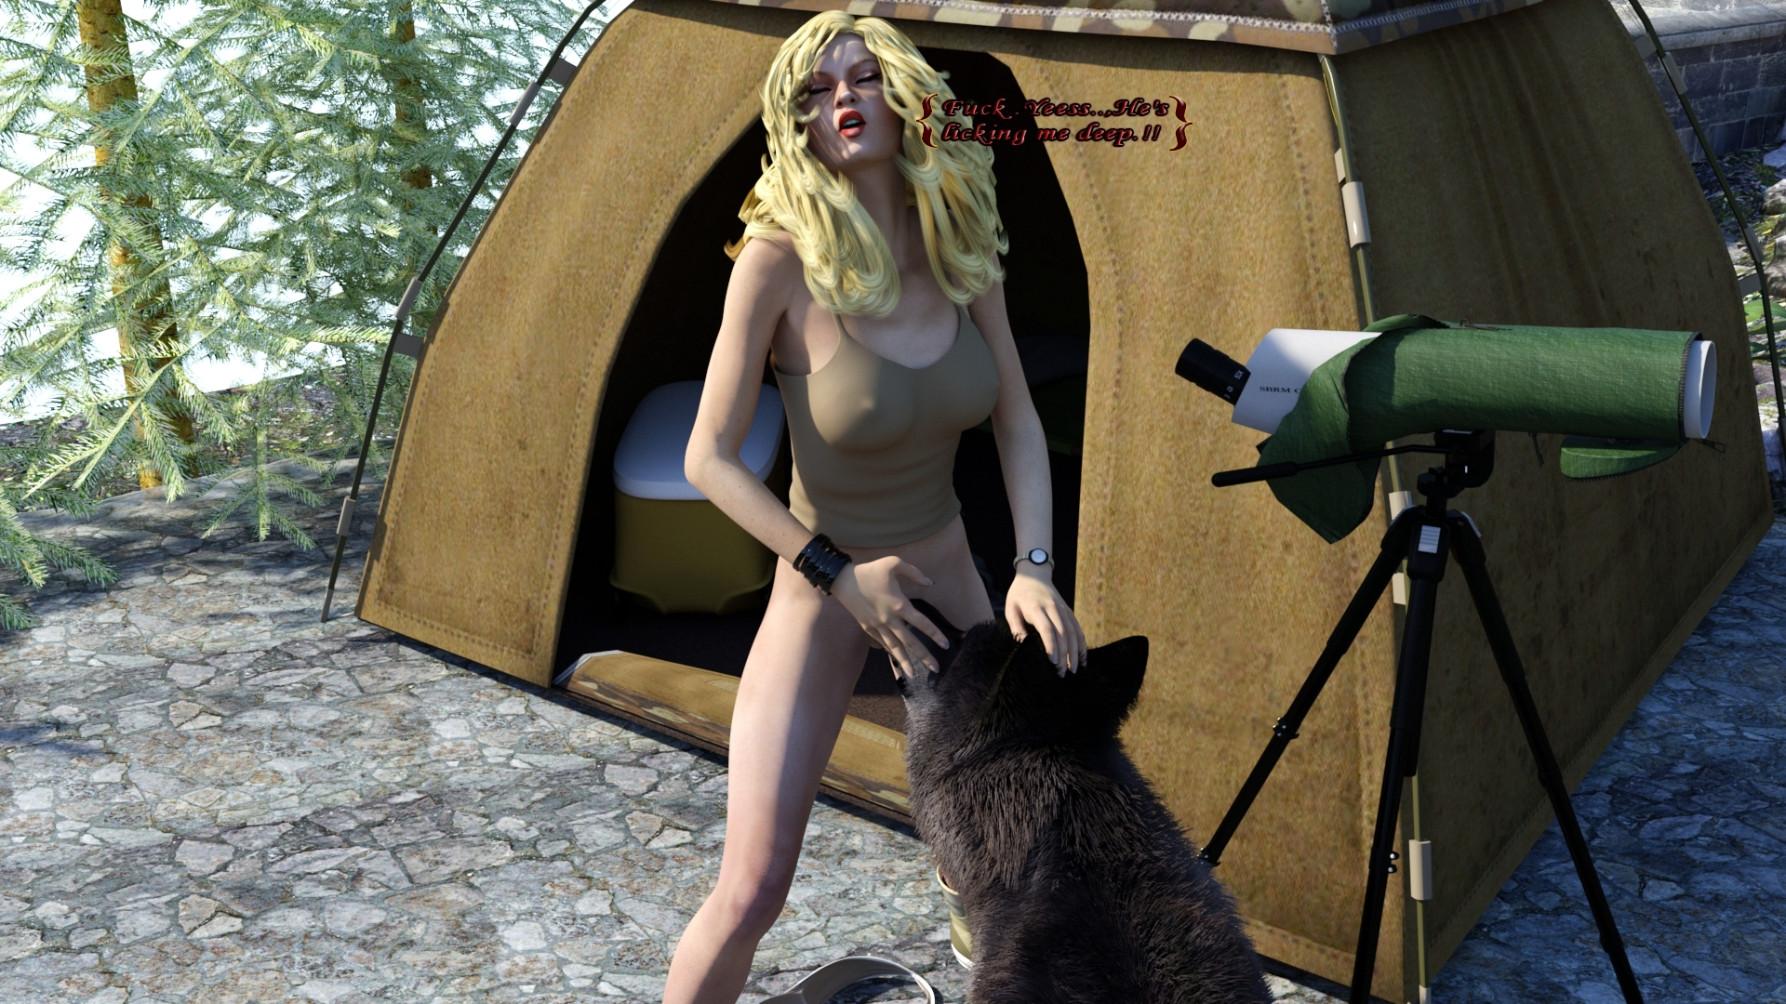 darksoul3d lone wolf 3d animal free porn comics